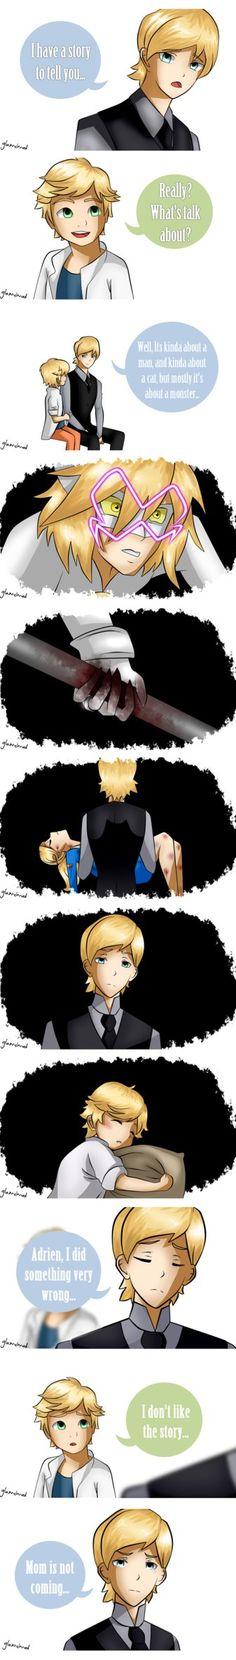 Soooooooooo..... I'm done xD Working in Adrien's performance <3<3 ... Chat Noir ir the cutest's thing I ever seen before :'3 [Its MINE SO DON'T TOUCH HIM!!!!1!!!!!!1!!!! ]